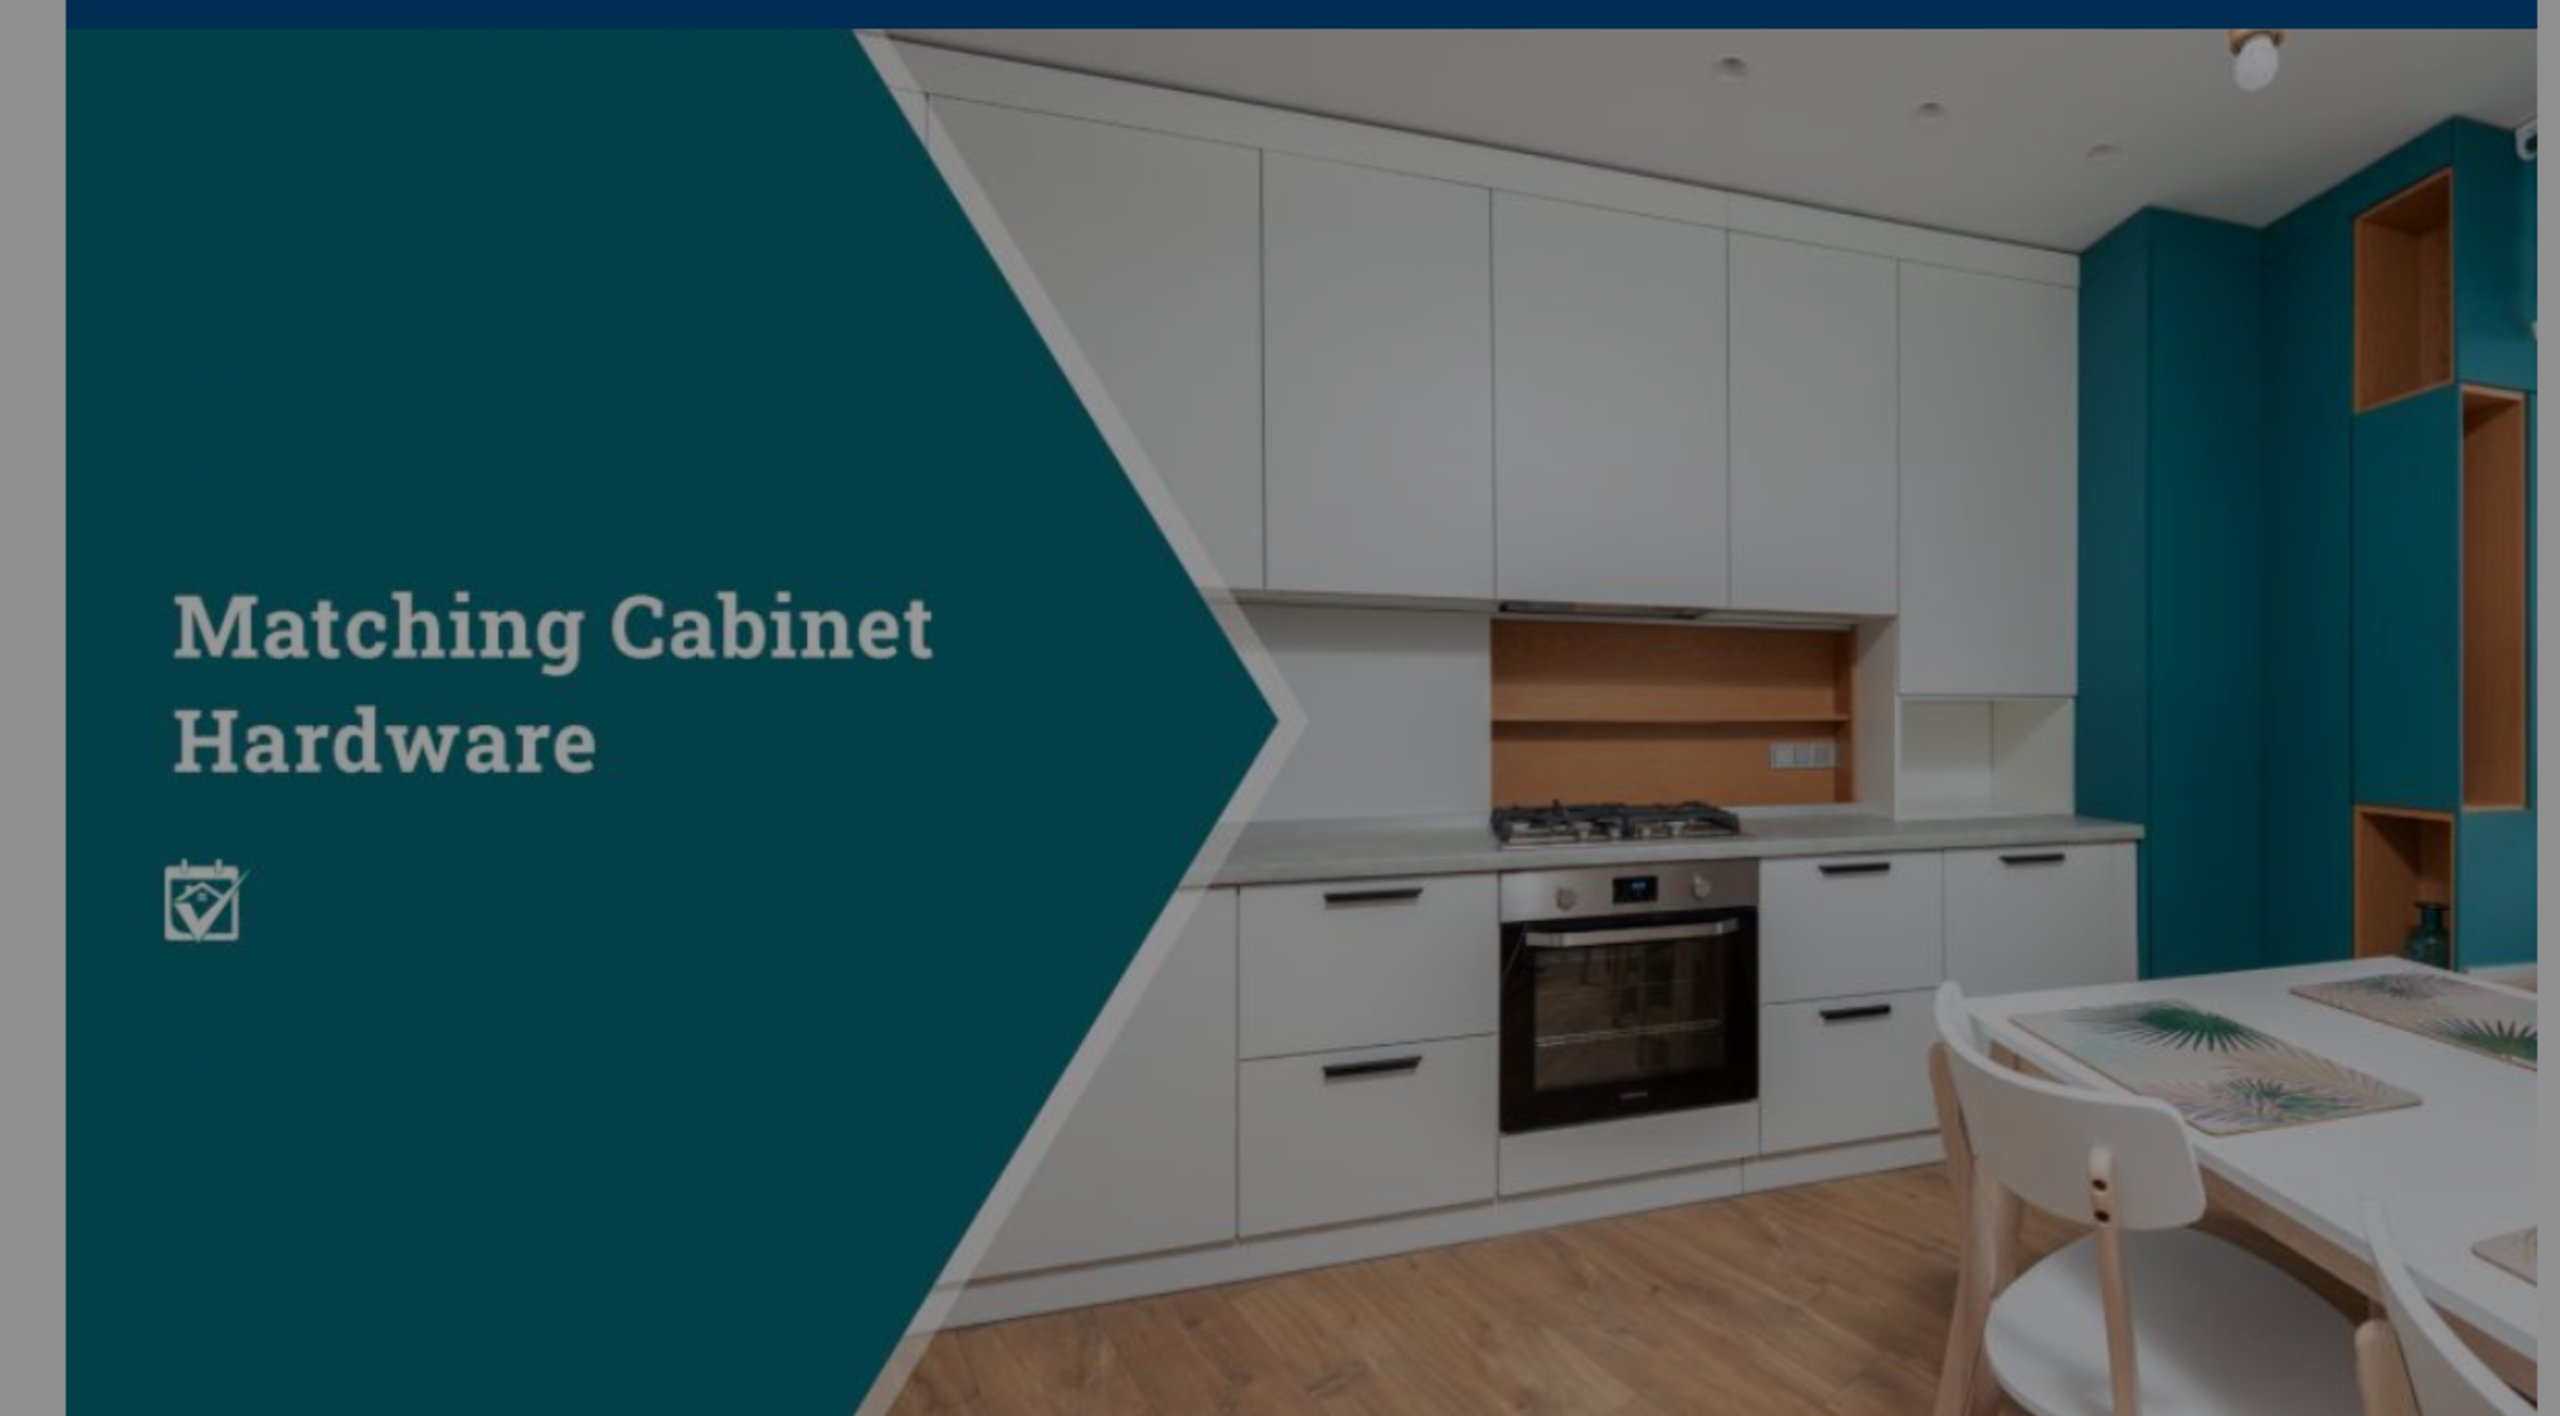 Matching Cabinet Hardware